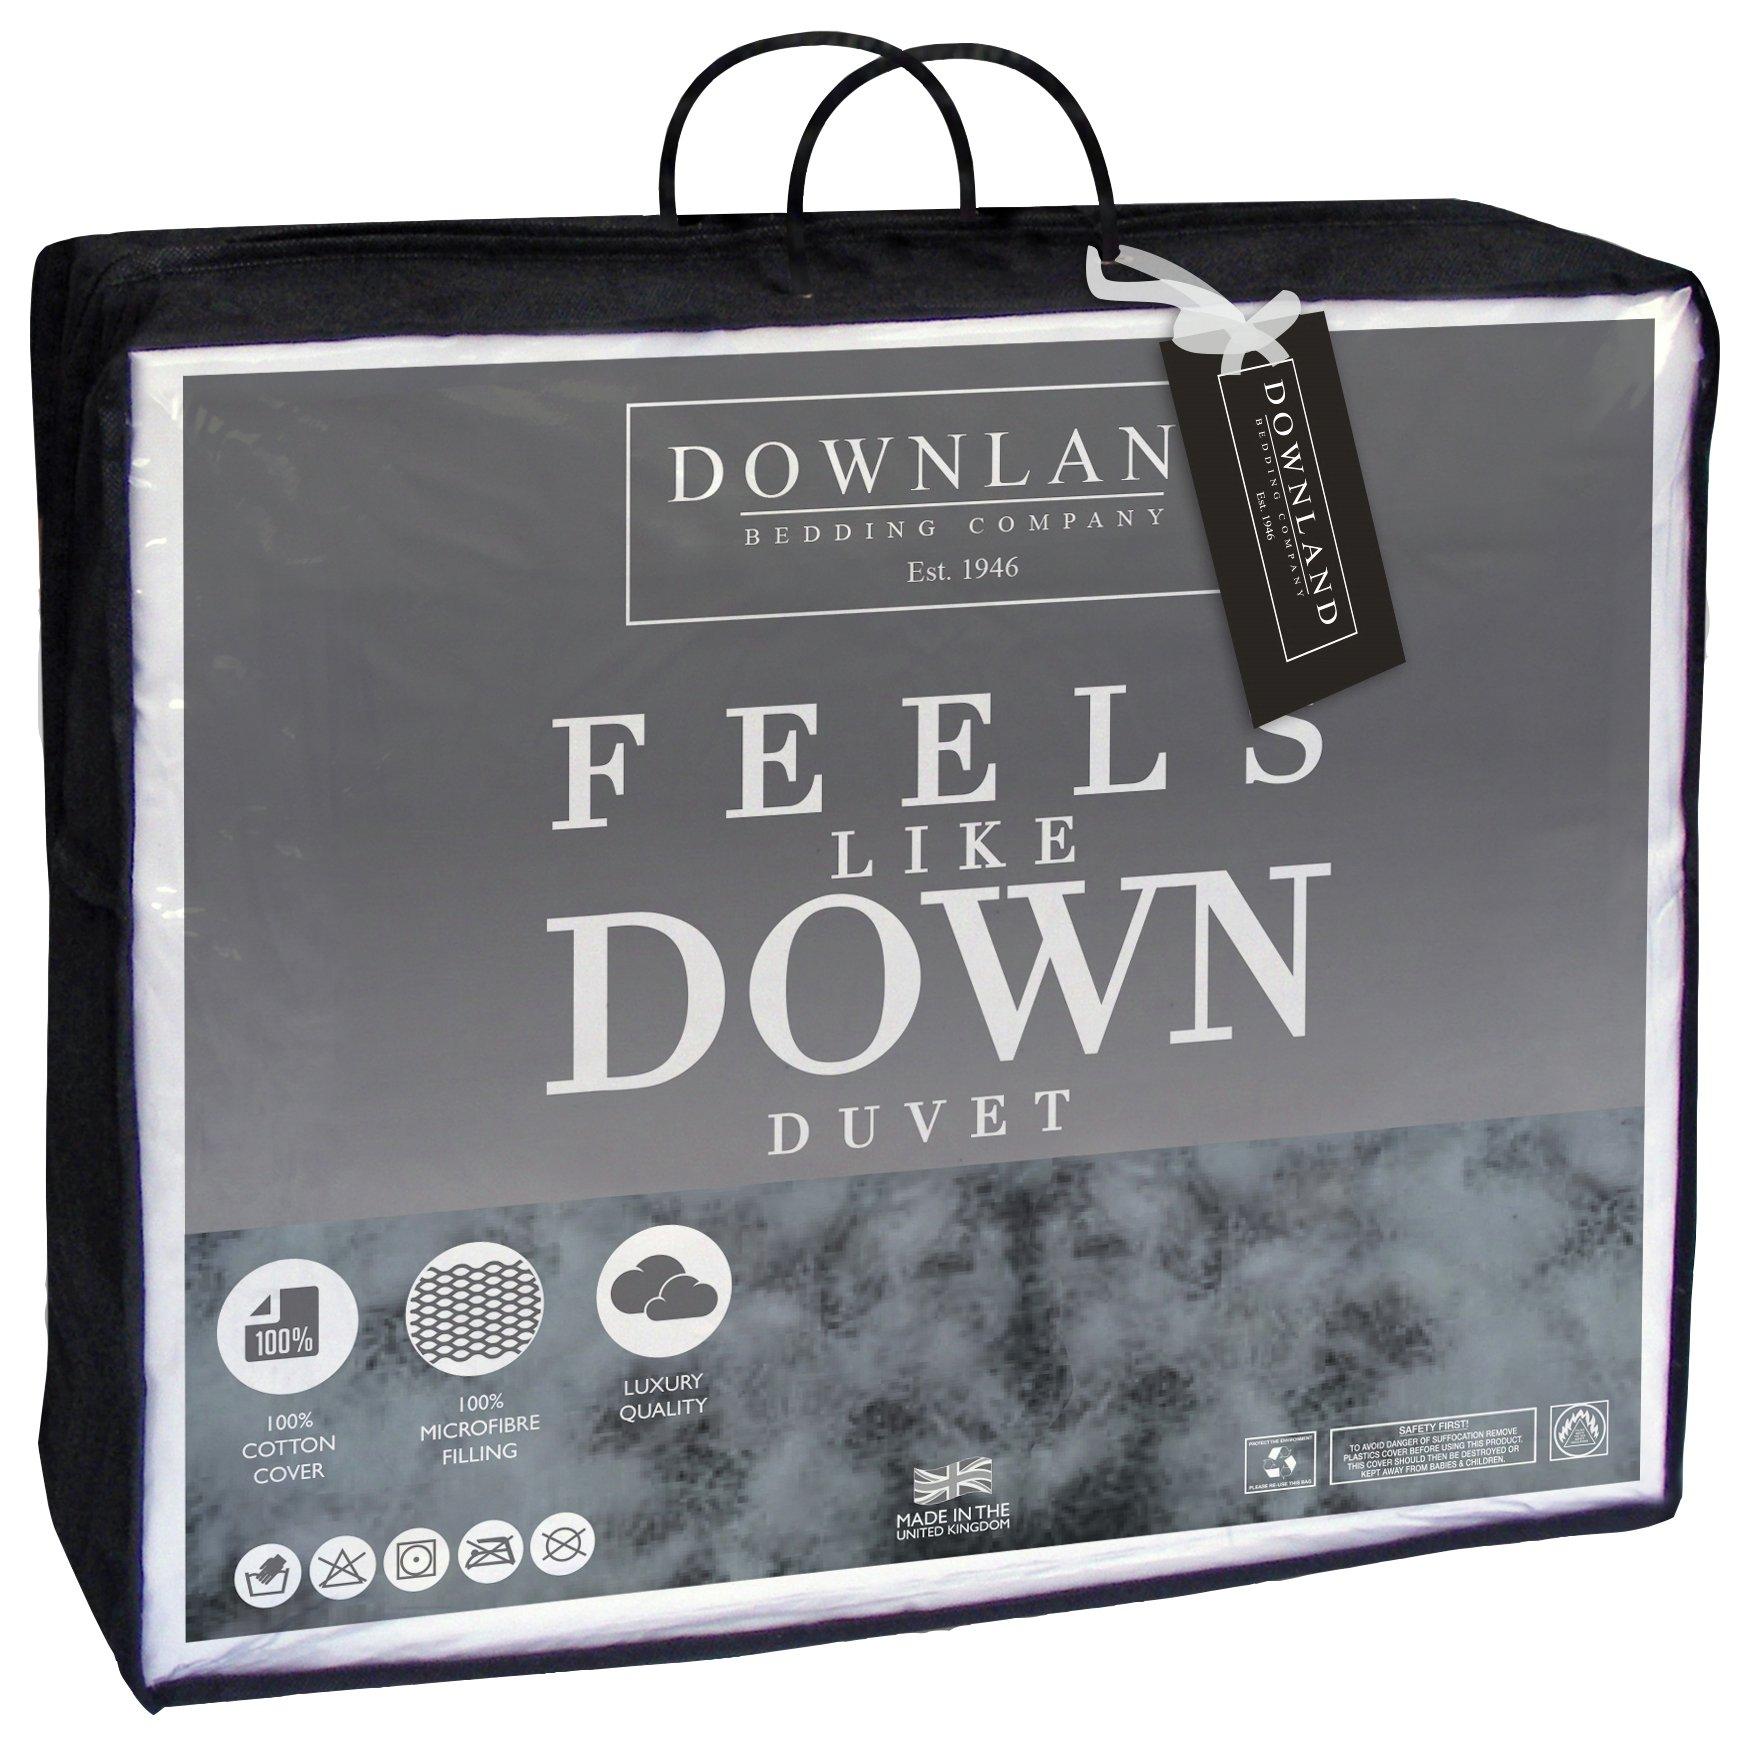 downland  105 tog feels like down  duvet  single